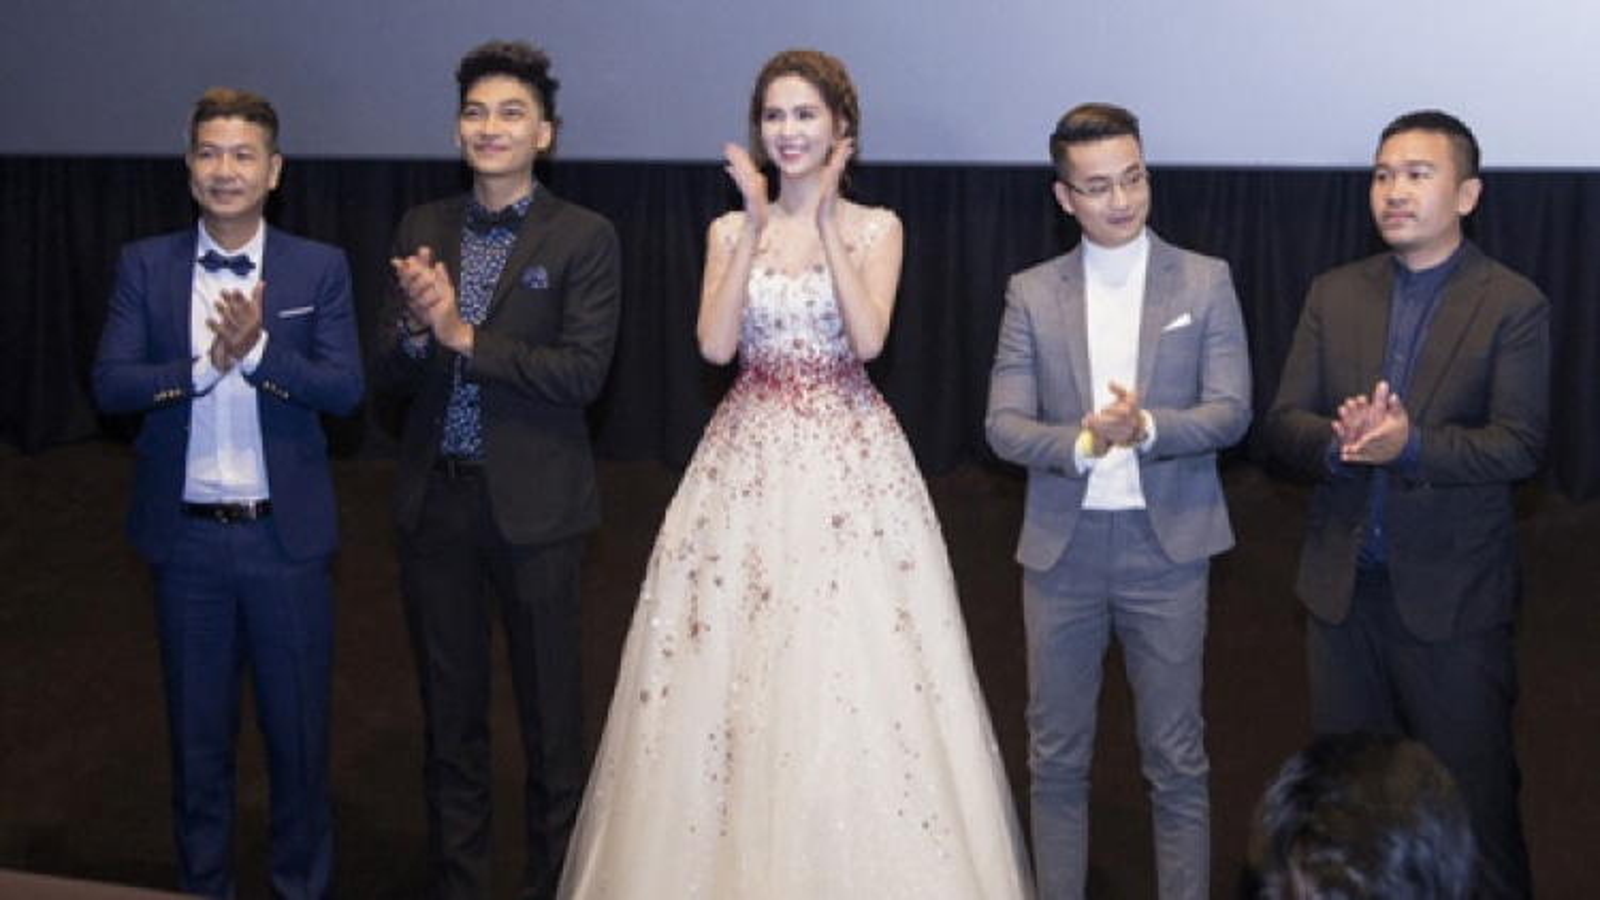 Ngoc Trinh charming at Vietnam Film Festival in Australia